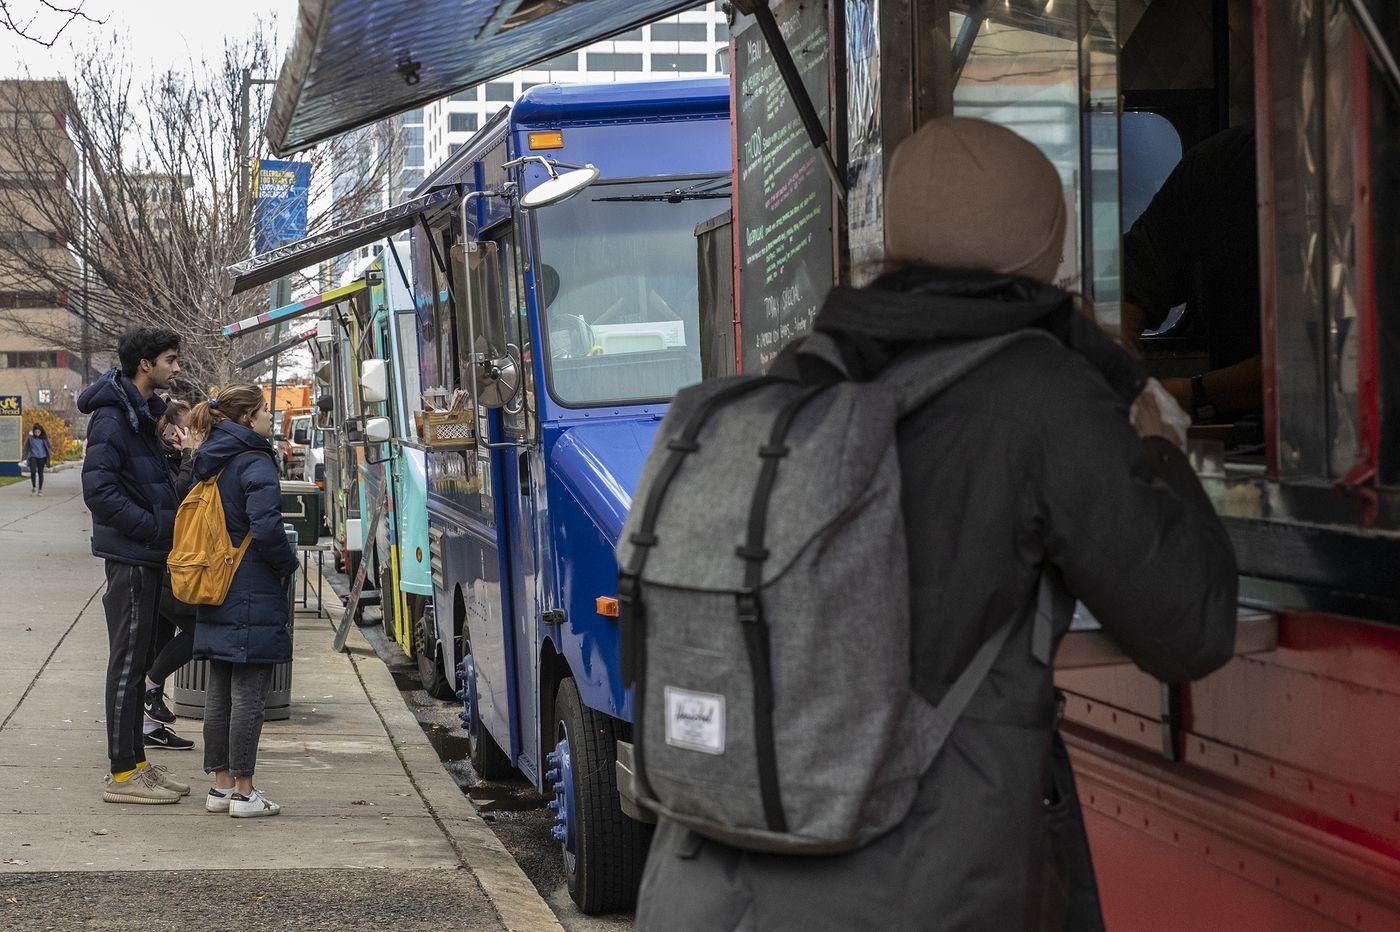 Cities should stop driving away food trucks | Editorial